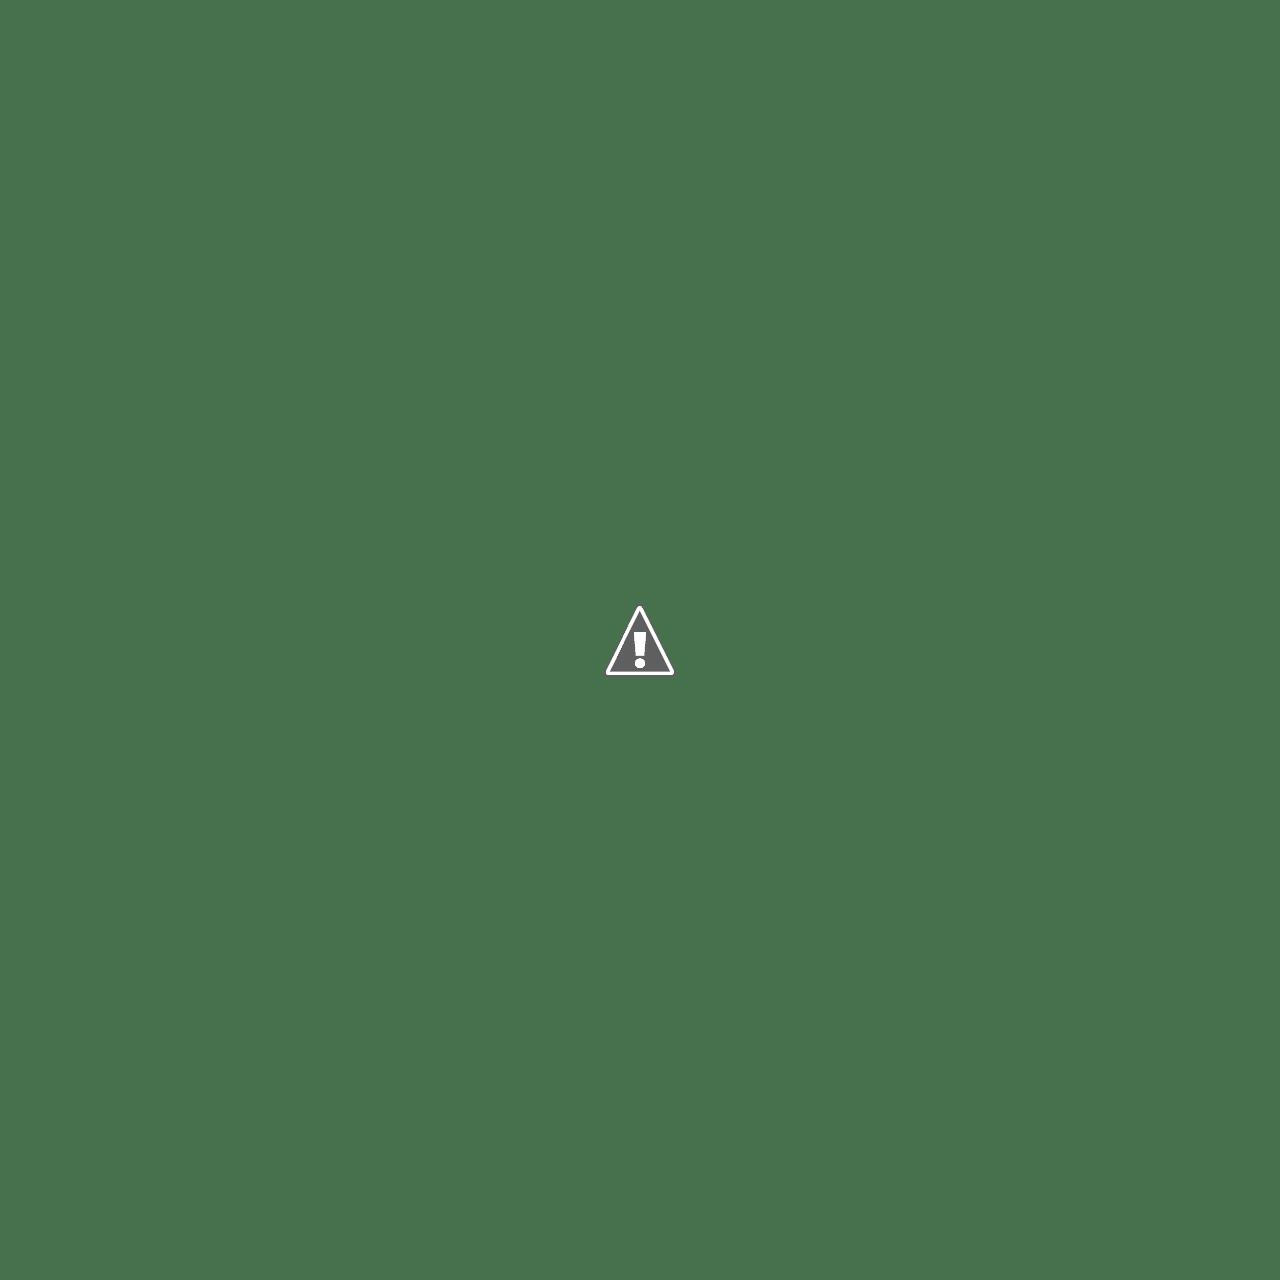 Fortis Body Piercing Piercing Shop In Fairfield